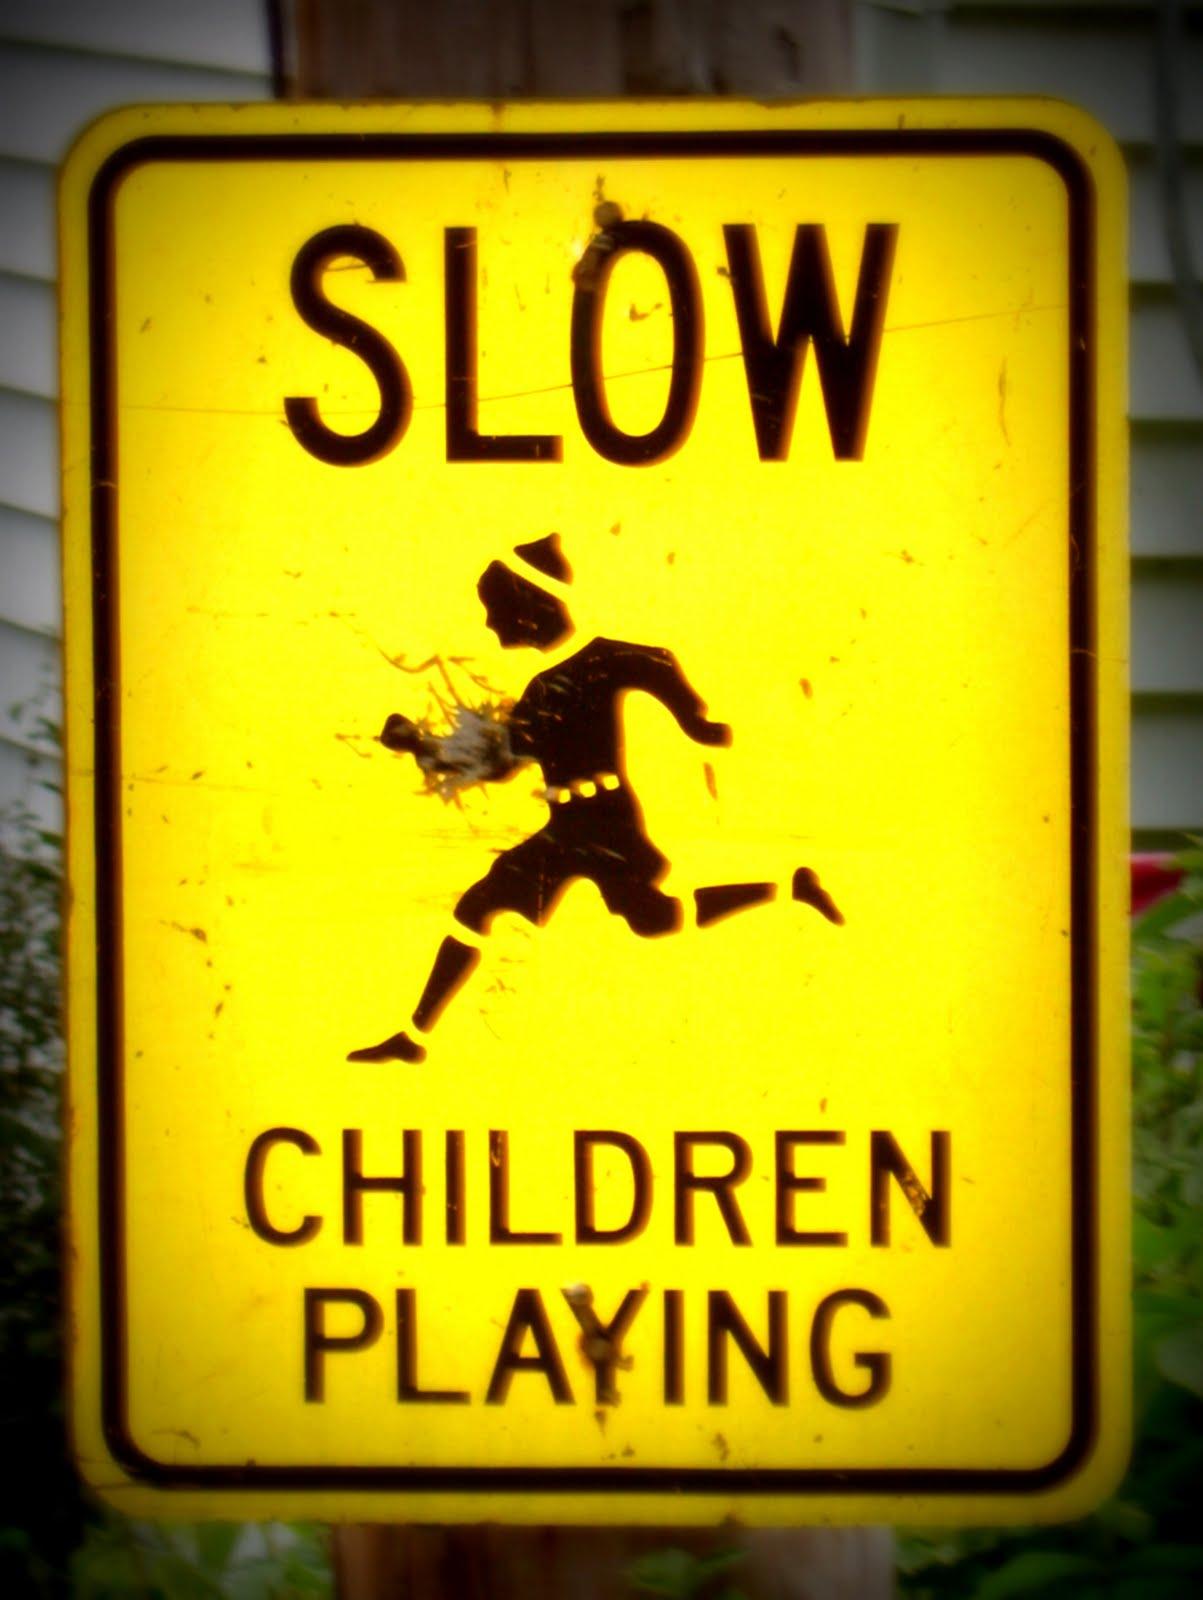 Caution: children playing